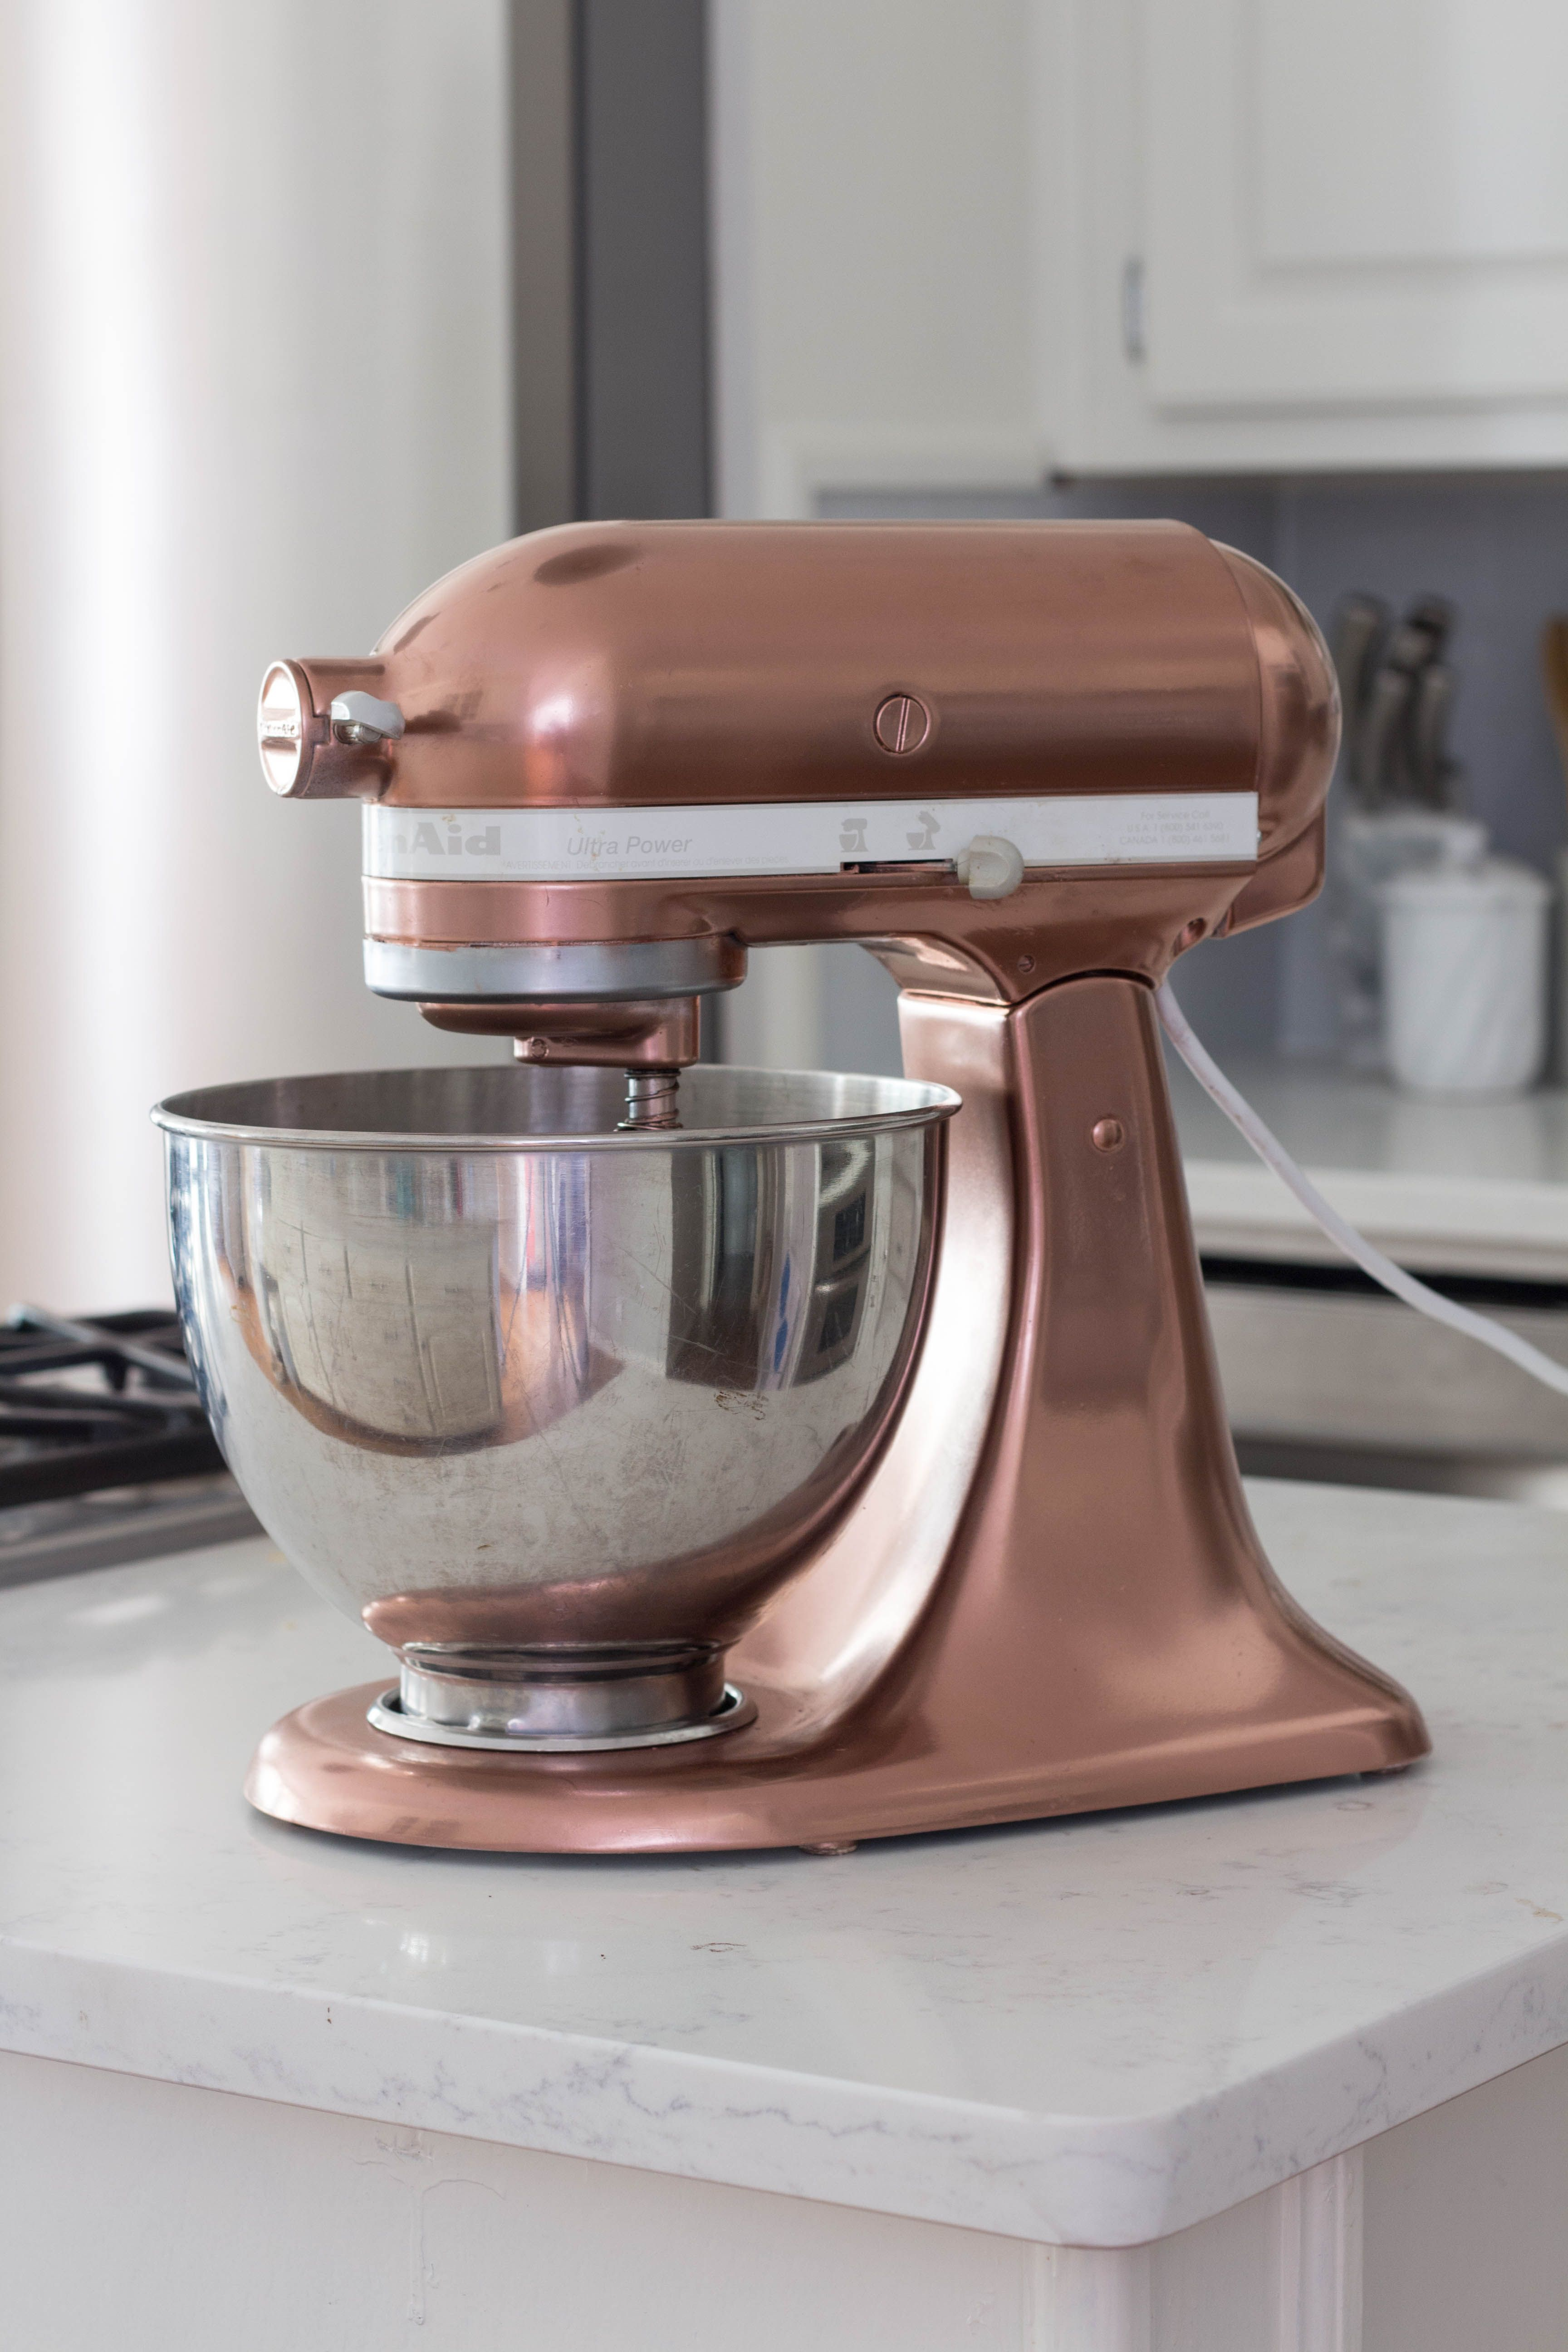 Copper Spray Painted Kitchenaid Mixer Paint Kitchenaid Mixer Copper Spray Paint Copper Kitchen Aid